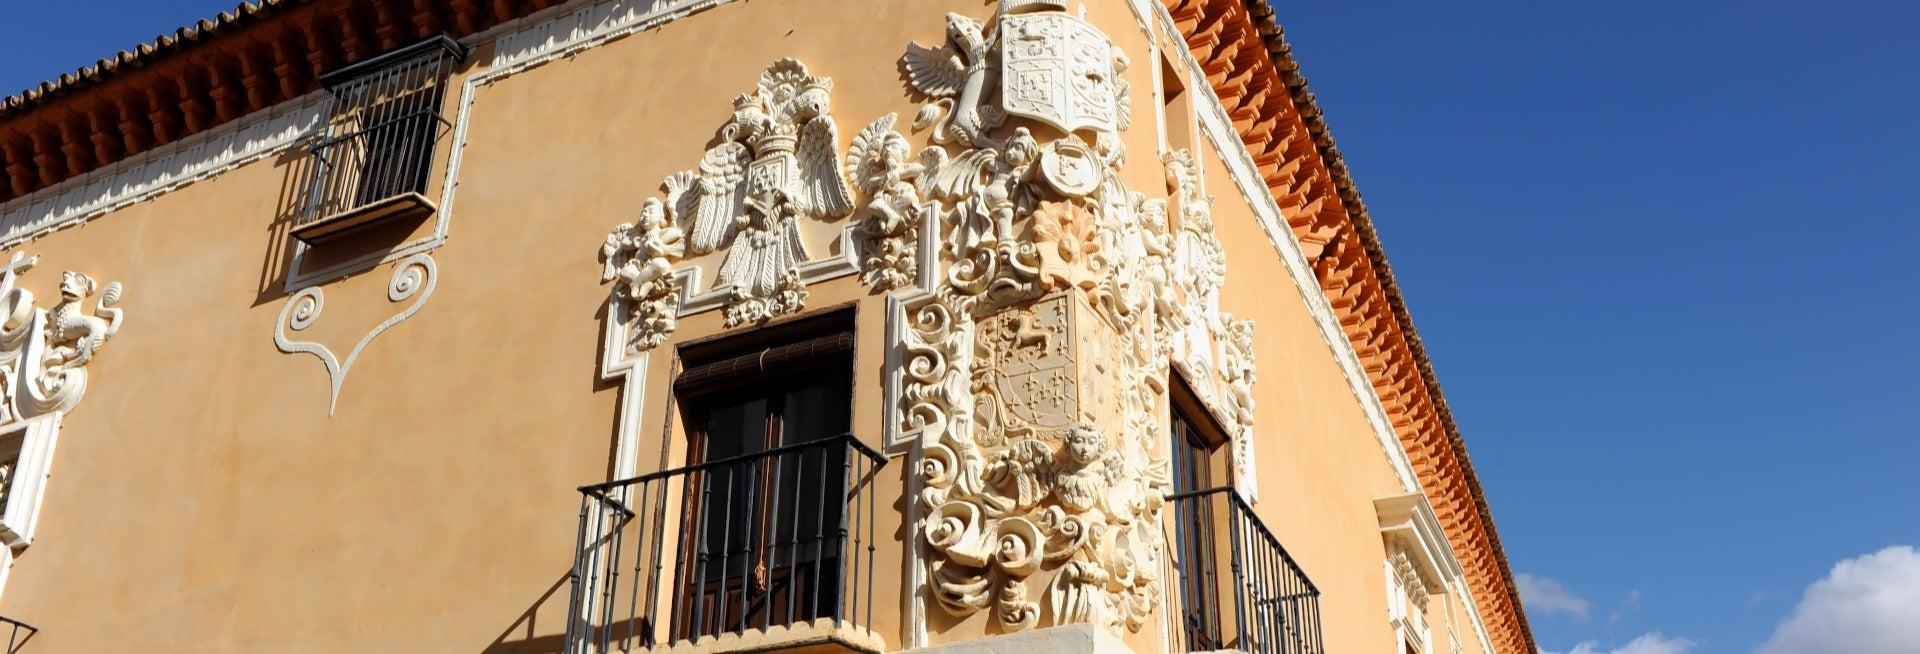 Visita guiada por Almendralejo